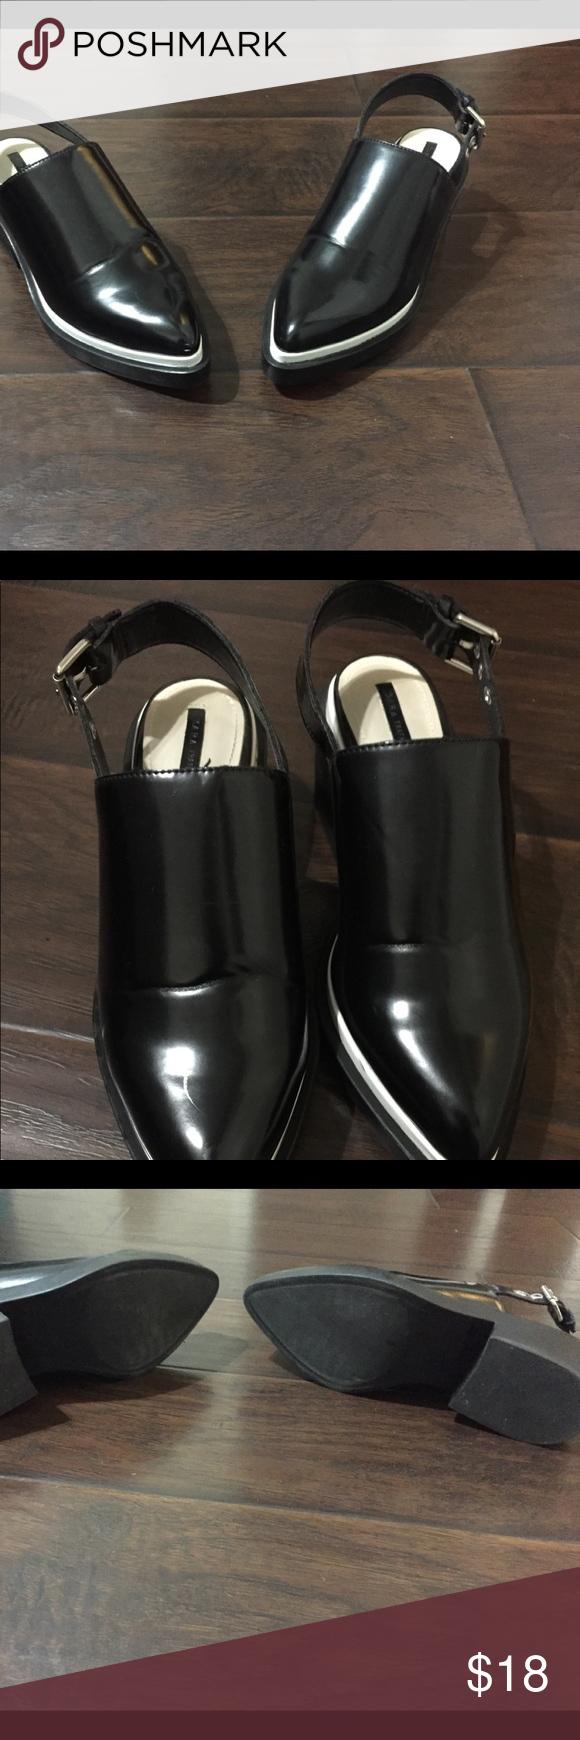 3ce861c0f51 EUC Zara TRF sling back shoes EUC Zara TRF Black sling back black shoes